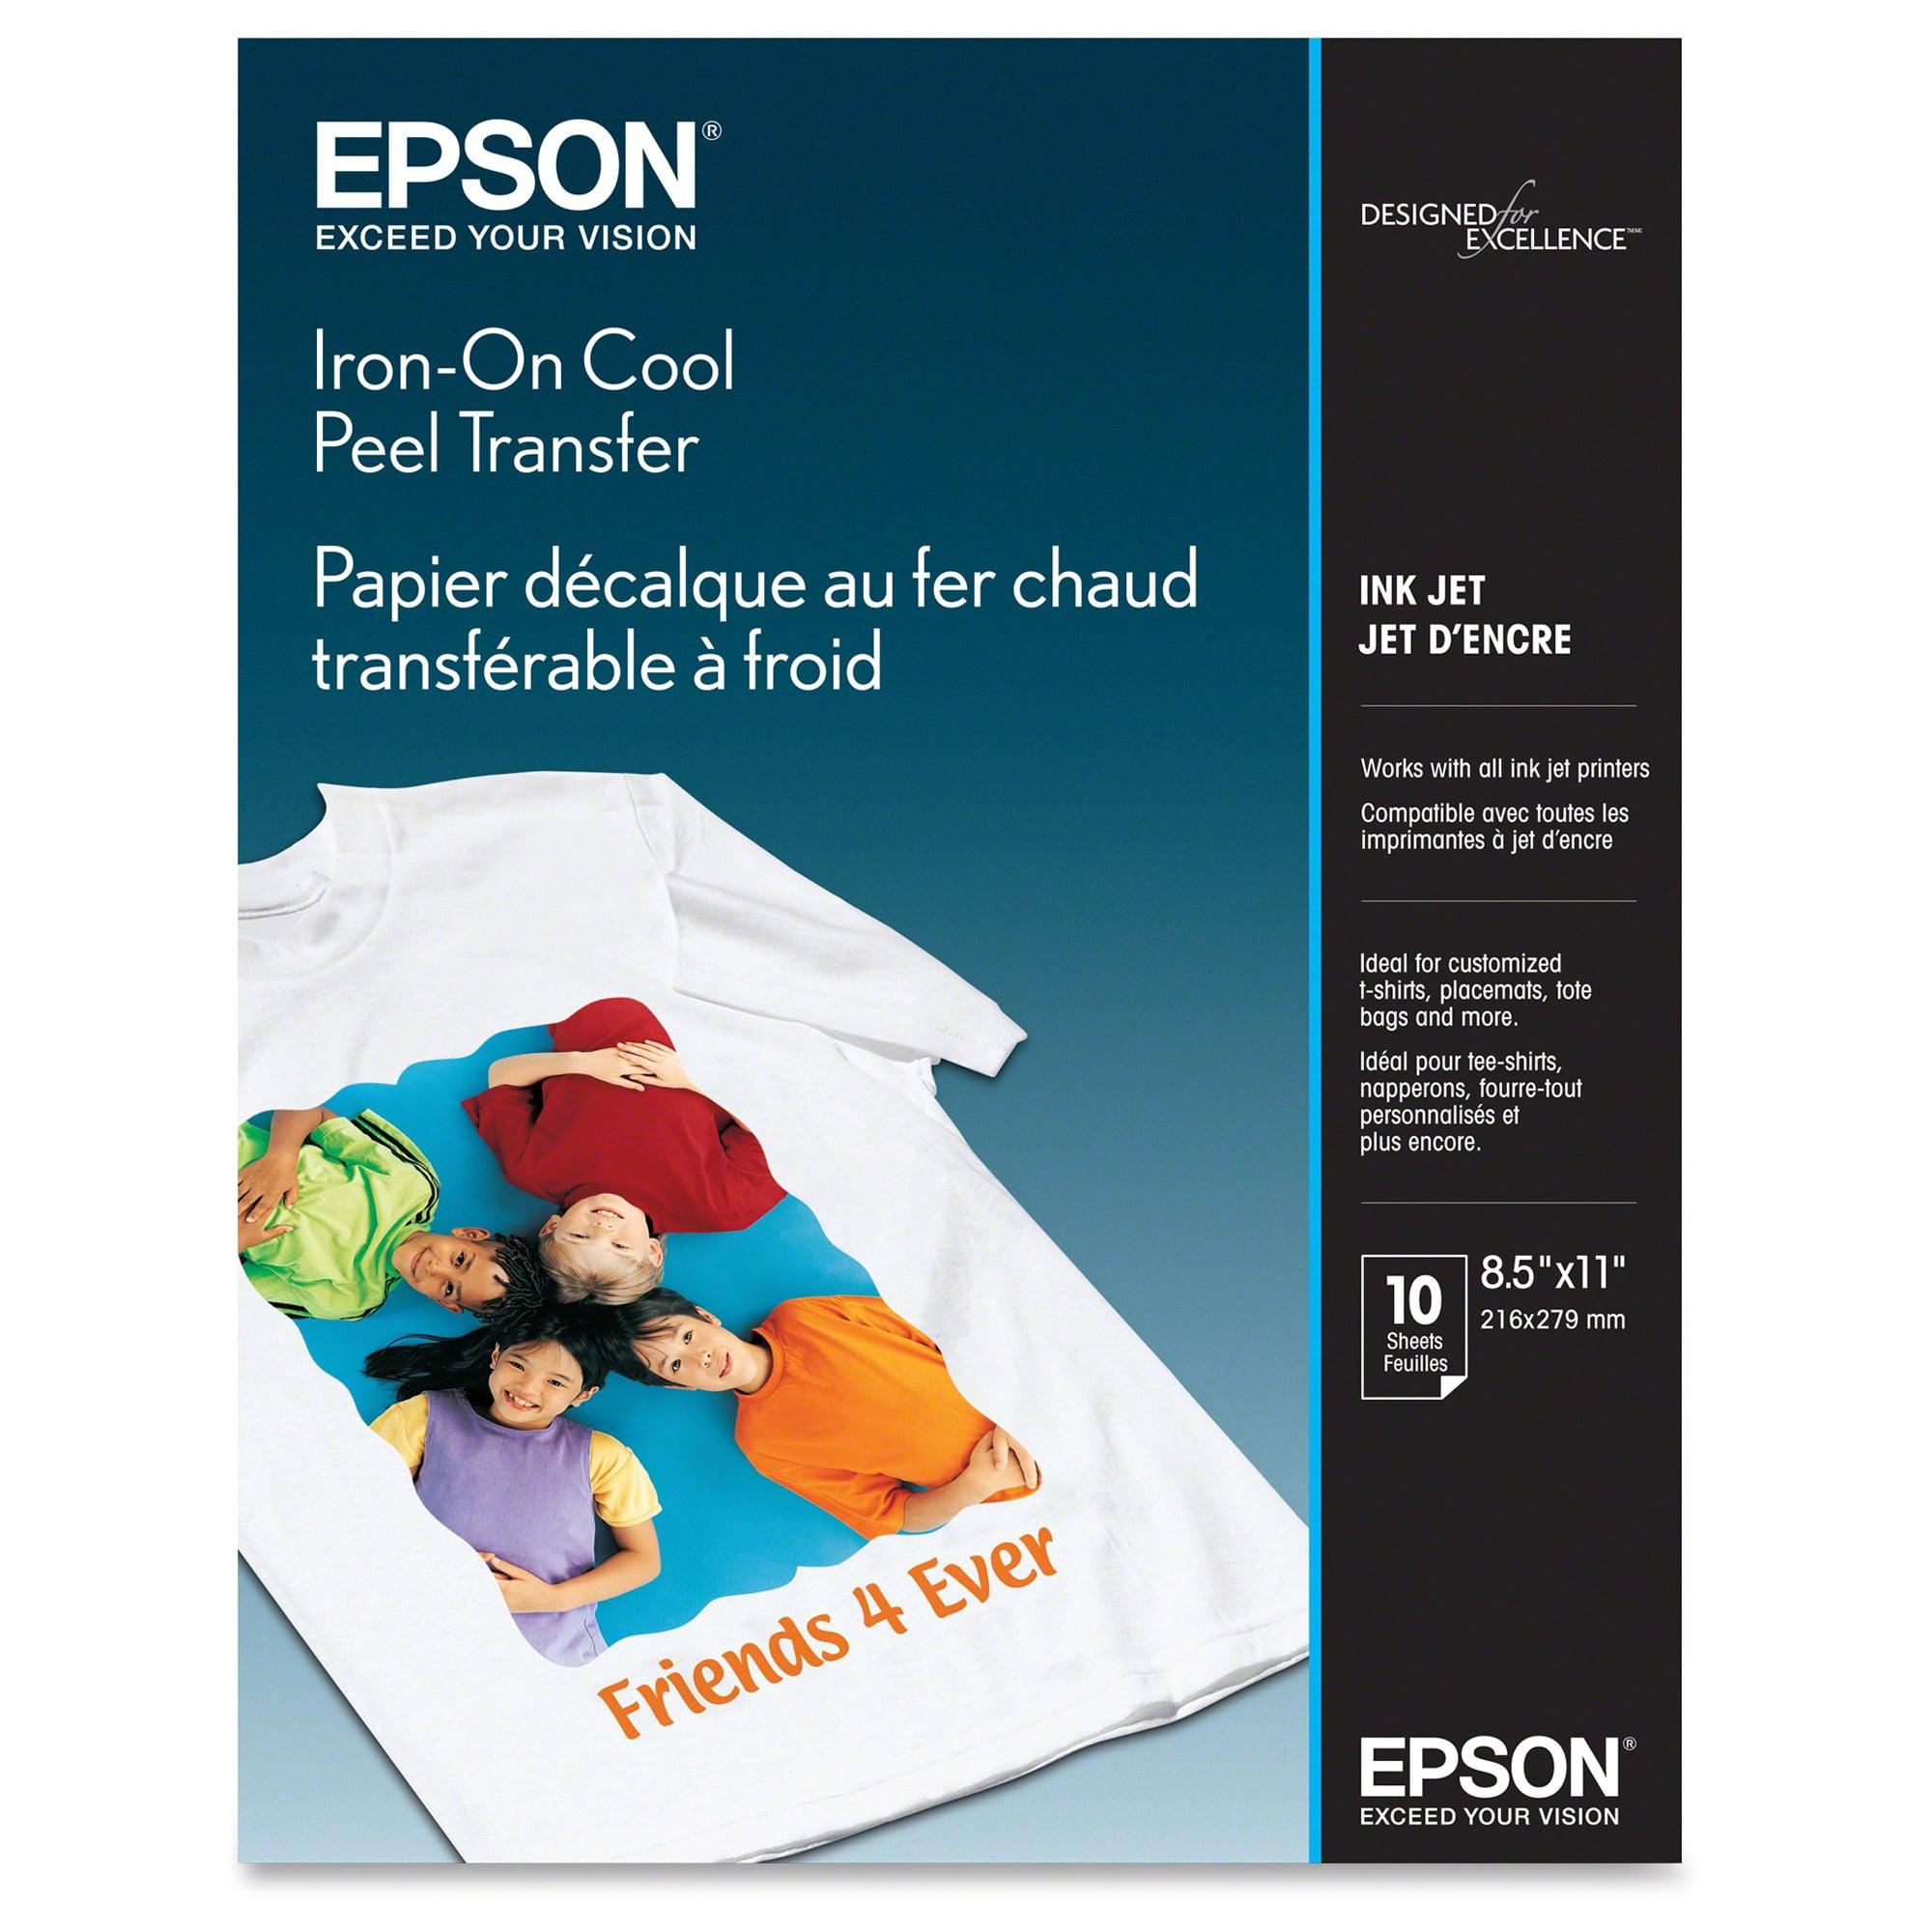 Epson Iron-On Cool Peel Transfer Paper, 8 5